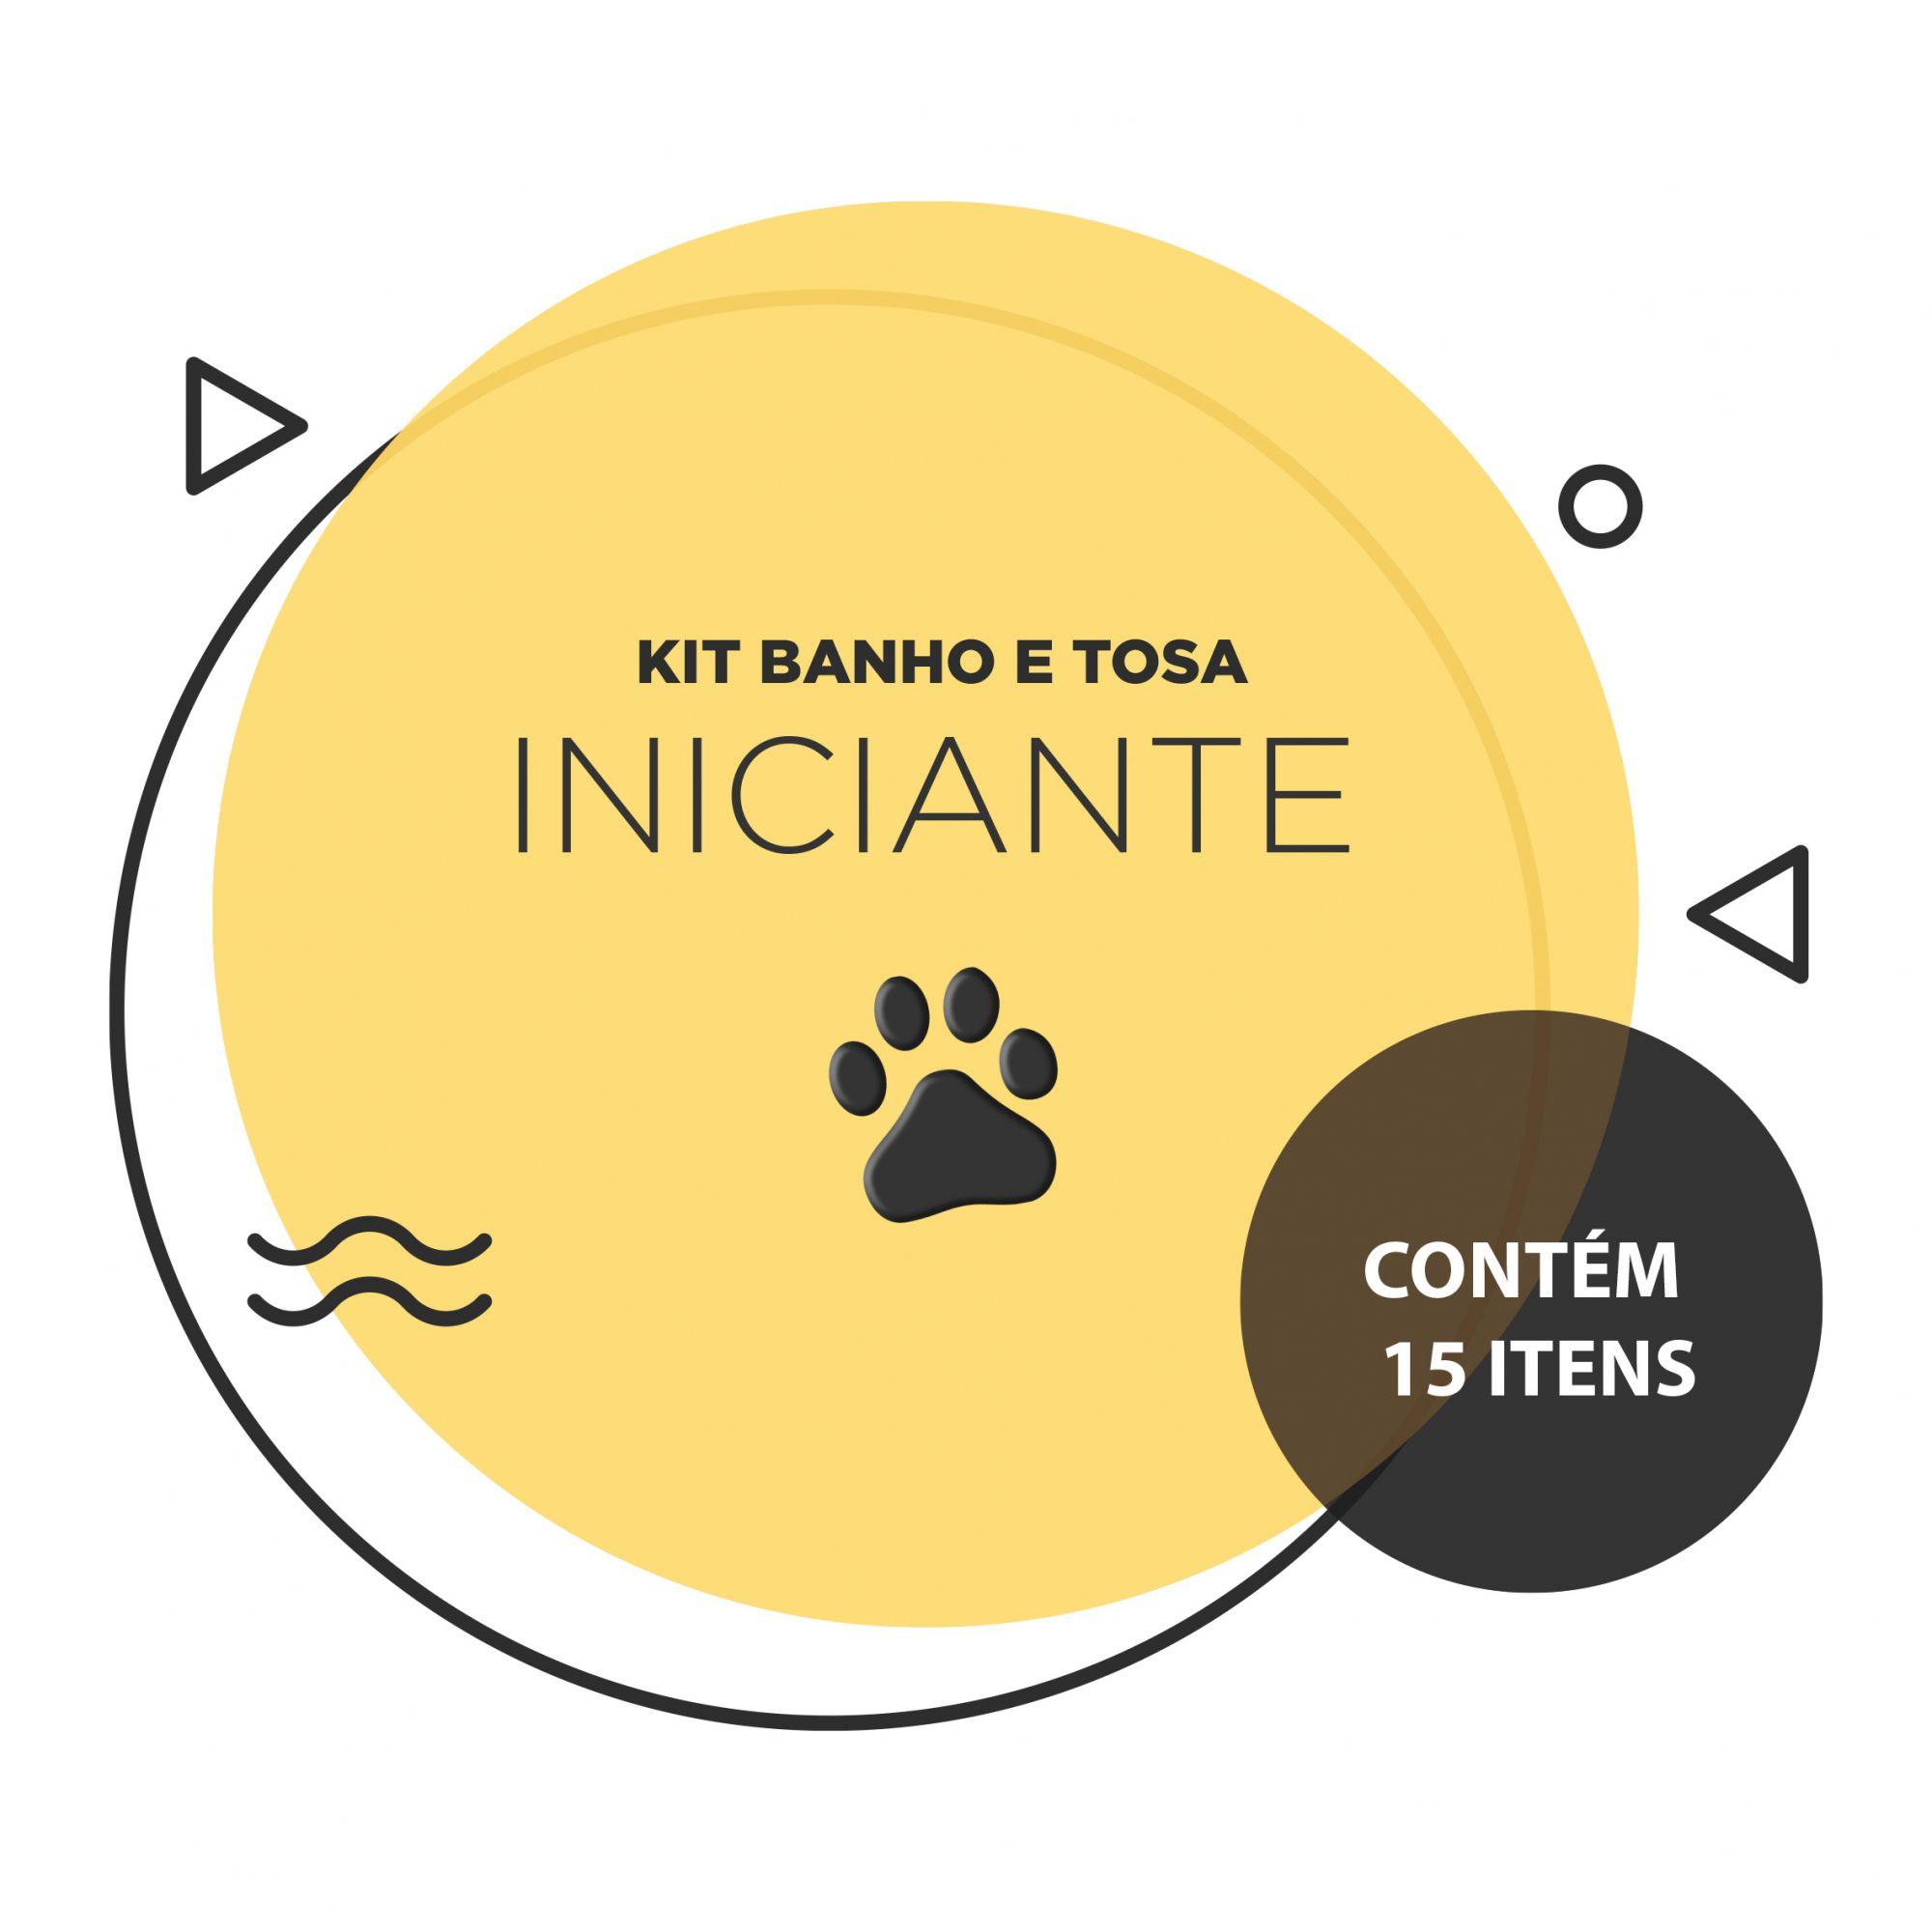 Kit Banho e Tosa - Iniciante